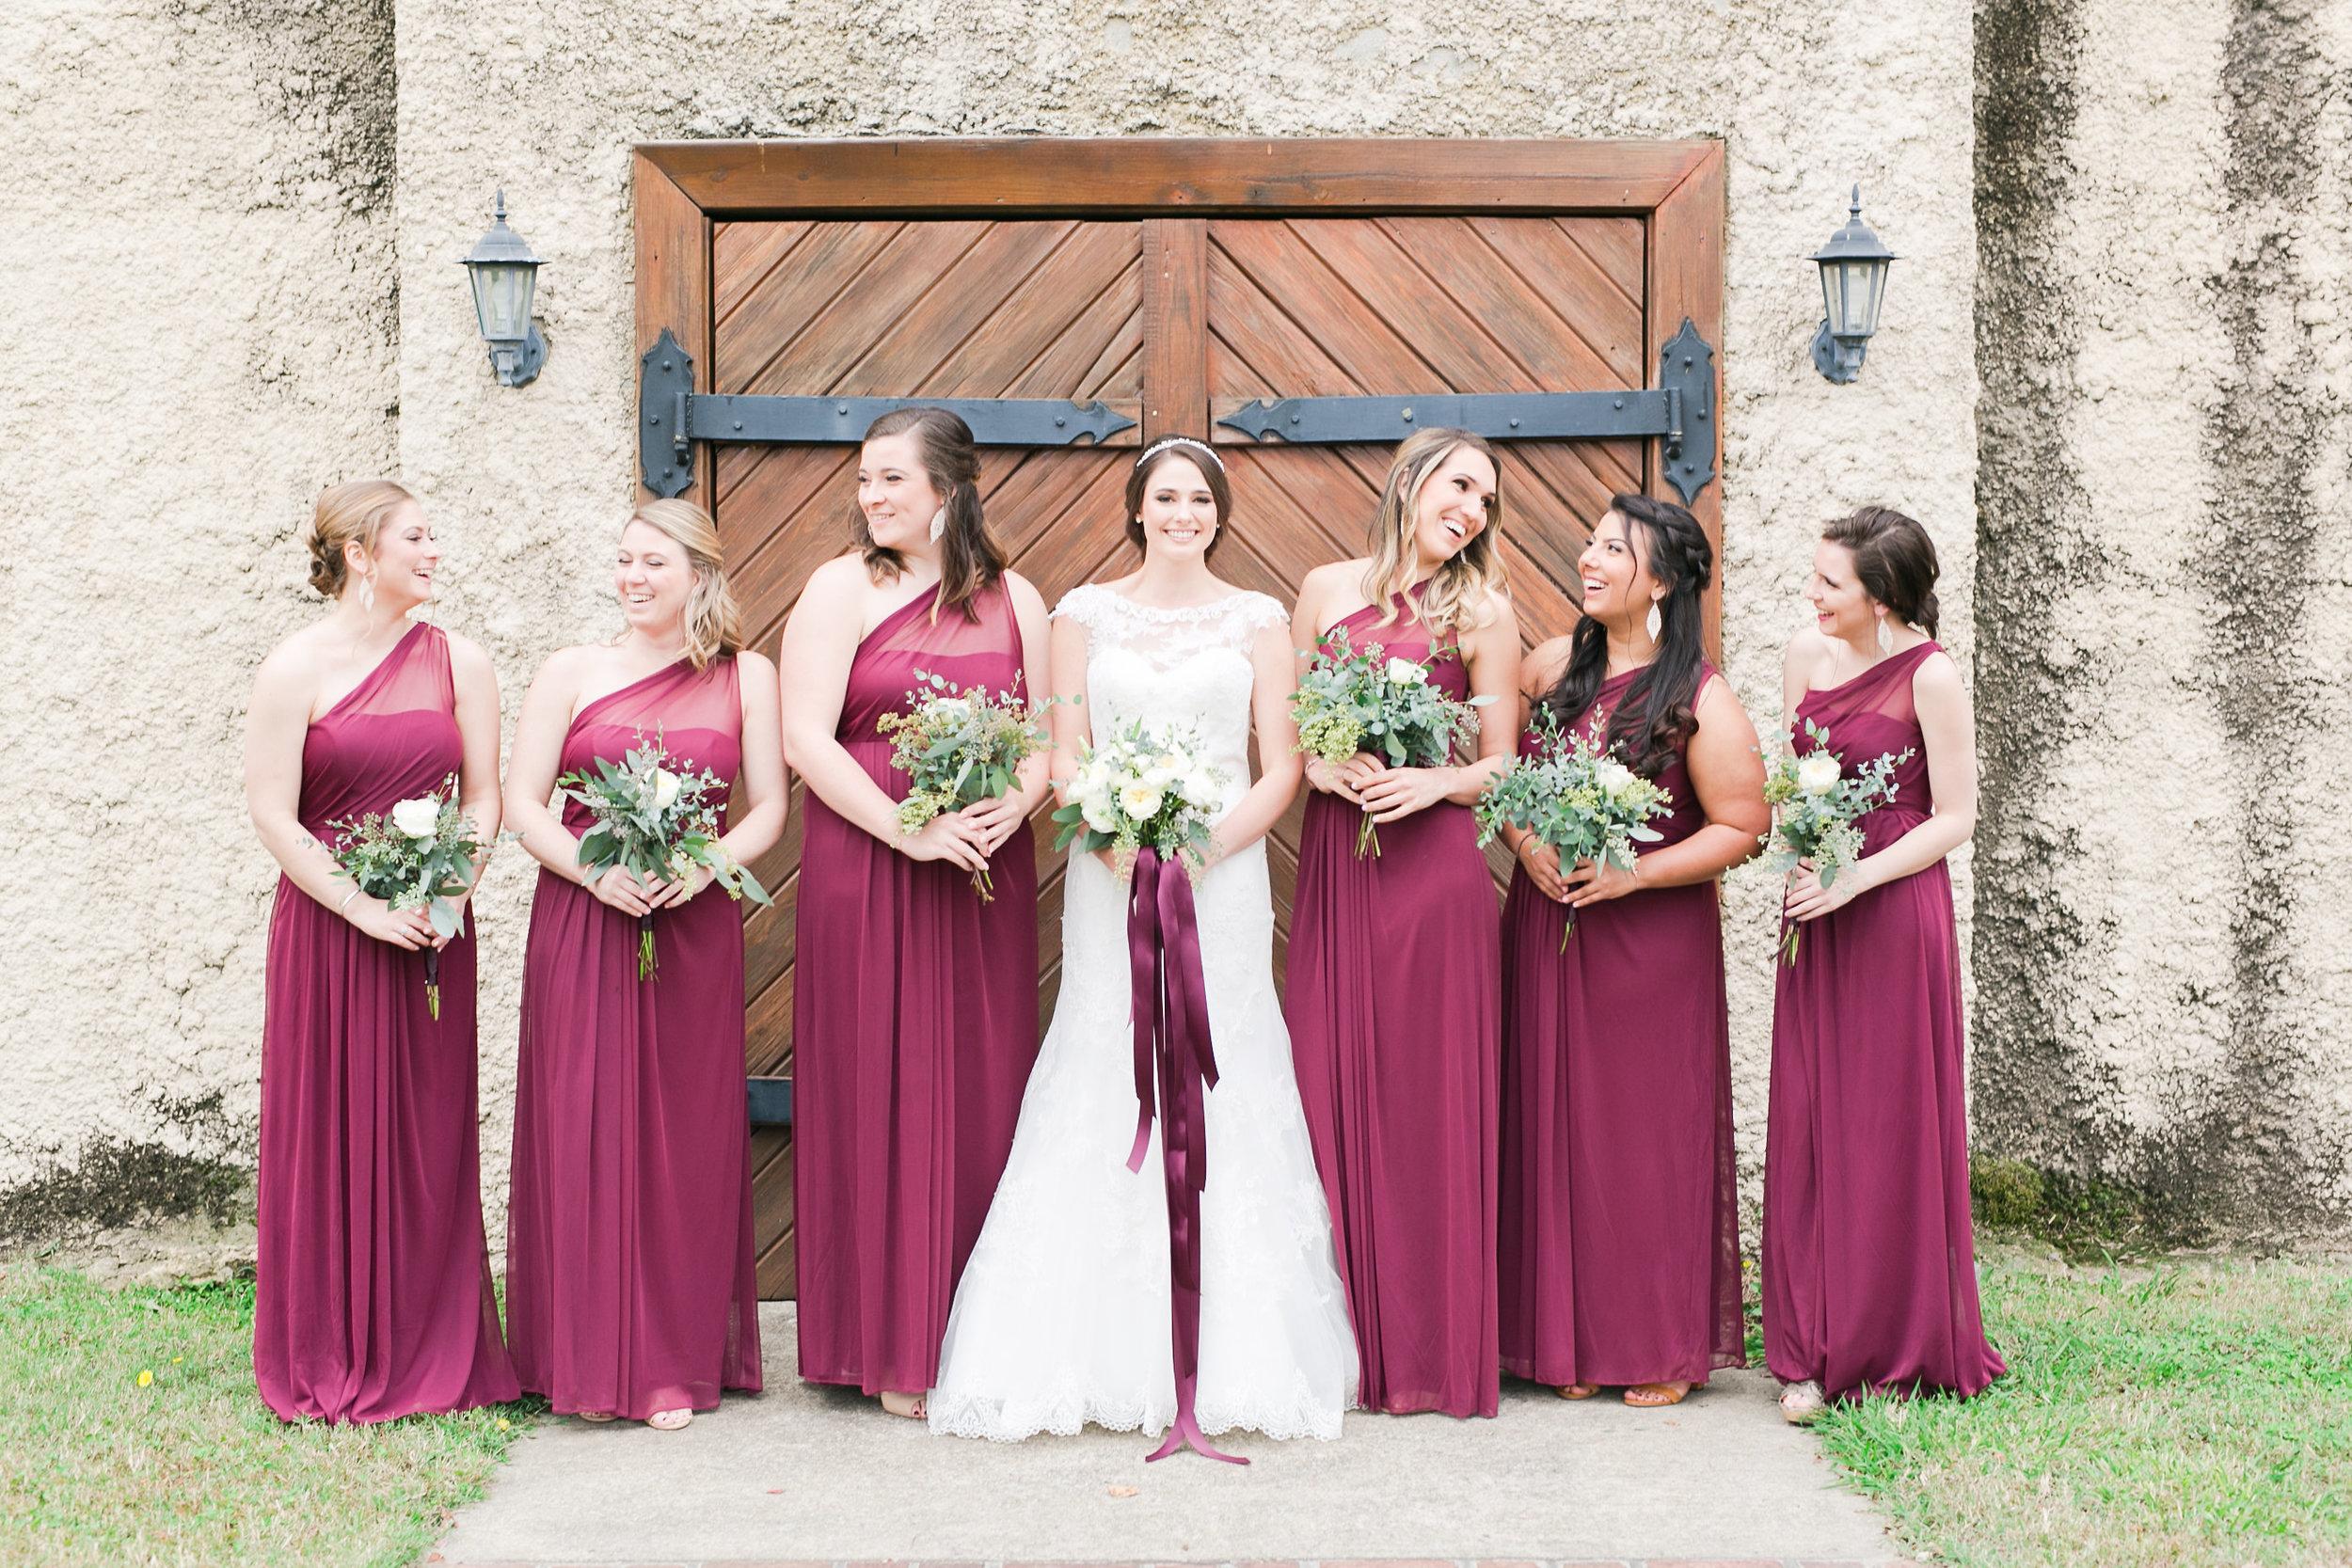 Bridesmaids-19.jpg